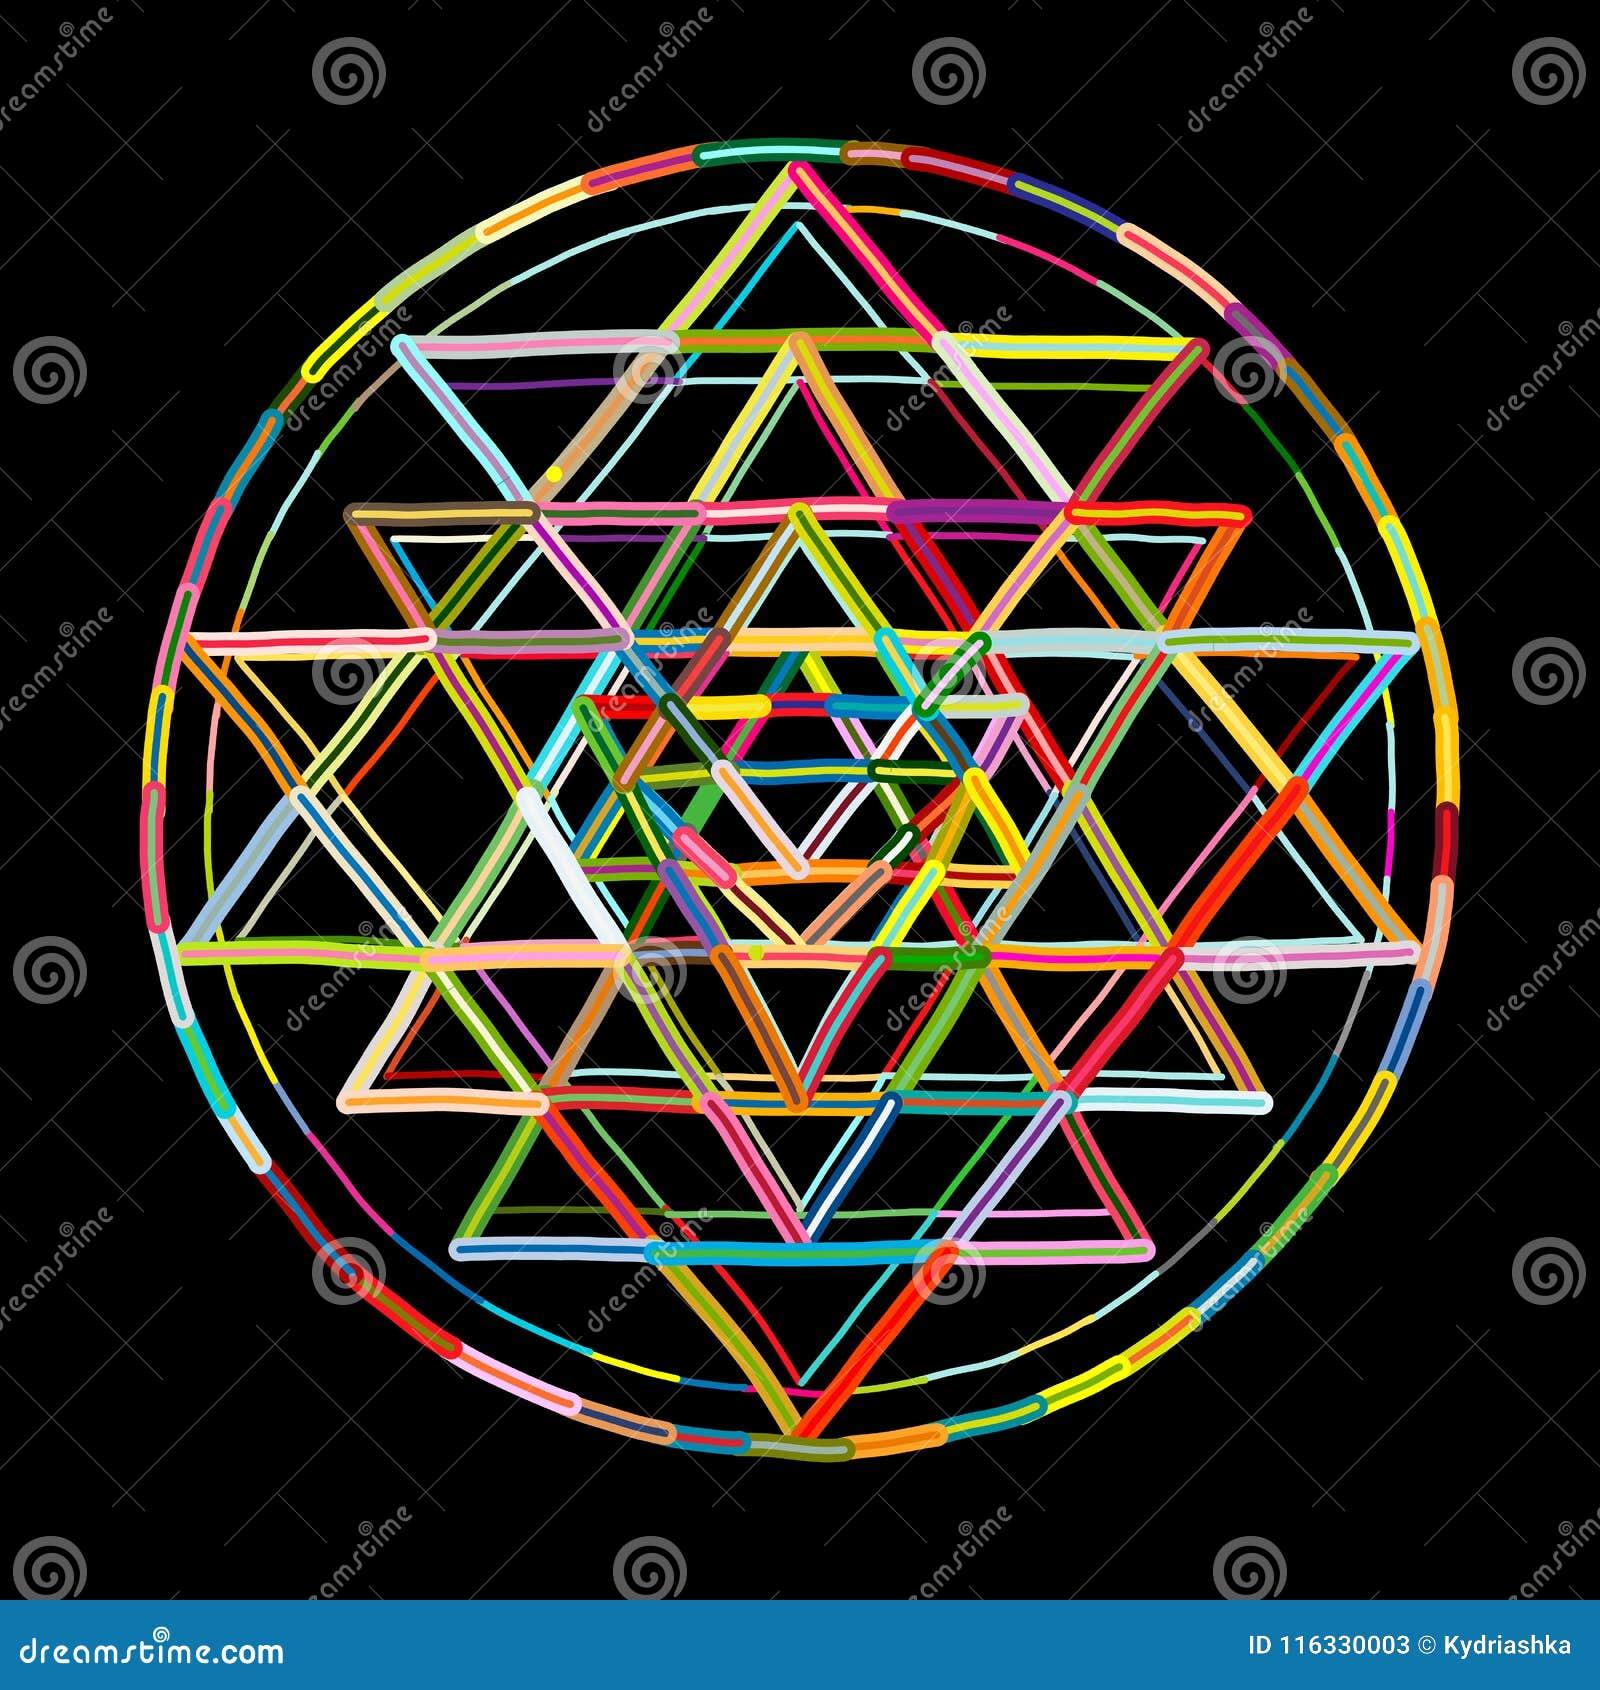 Sacred Geometry And Alchemy Symbol Sri Yantra  Hand Drawn